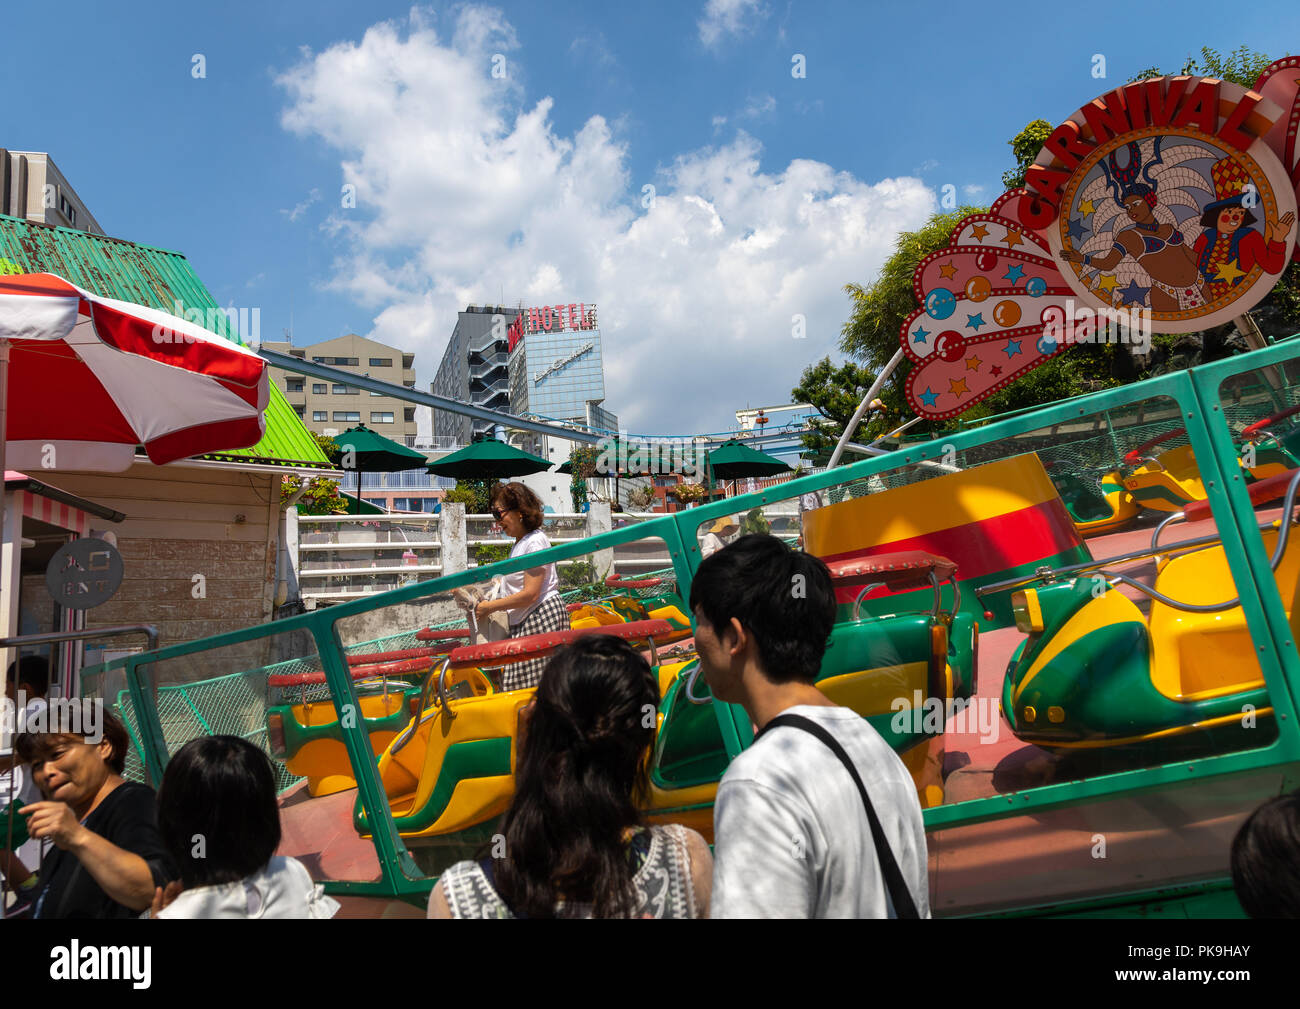 Carousel in Hanayashiki park, Kanto region, Tokyo, Japan - Stock Image